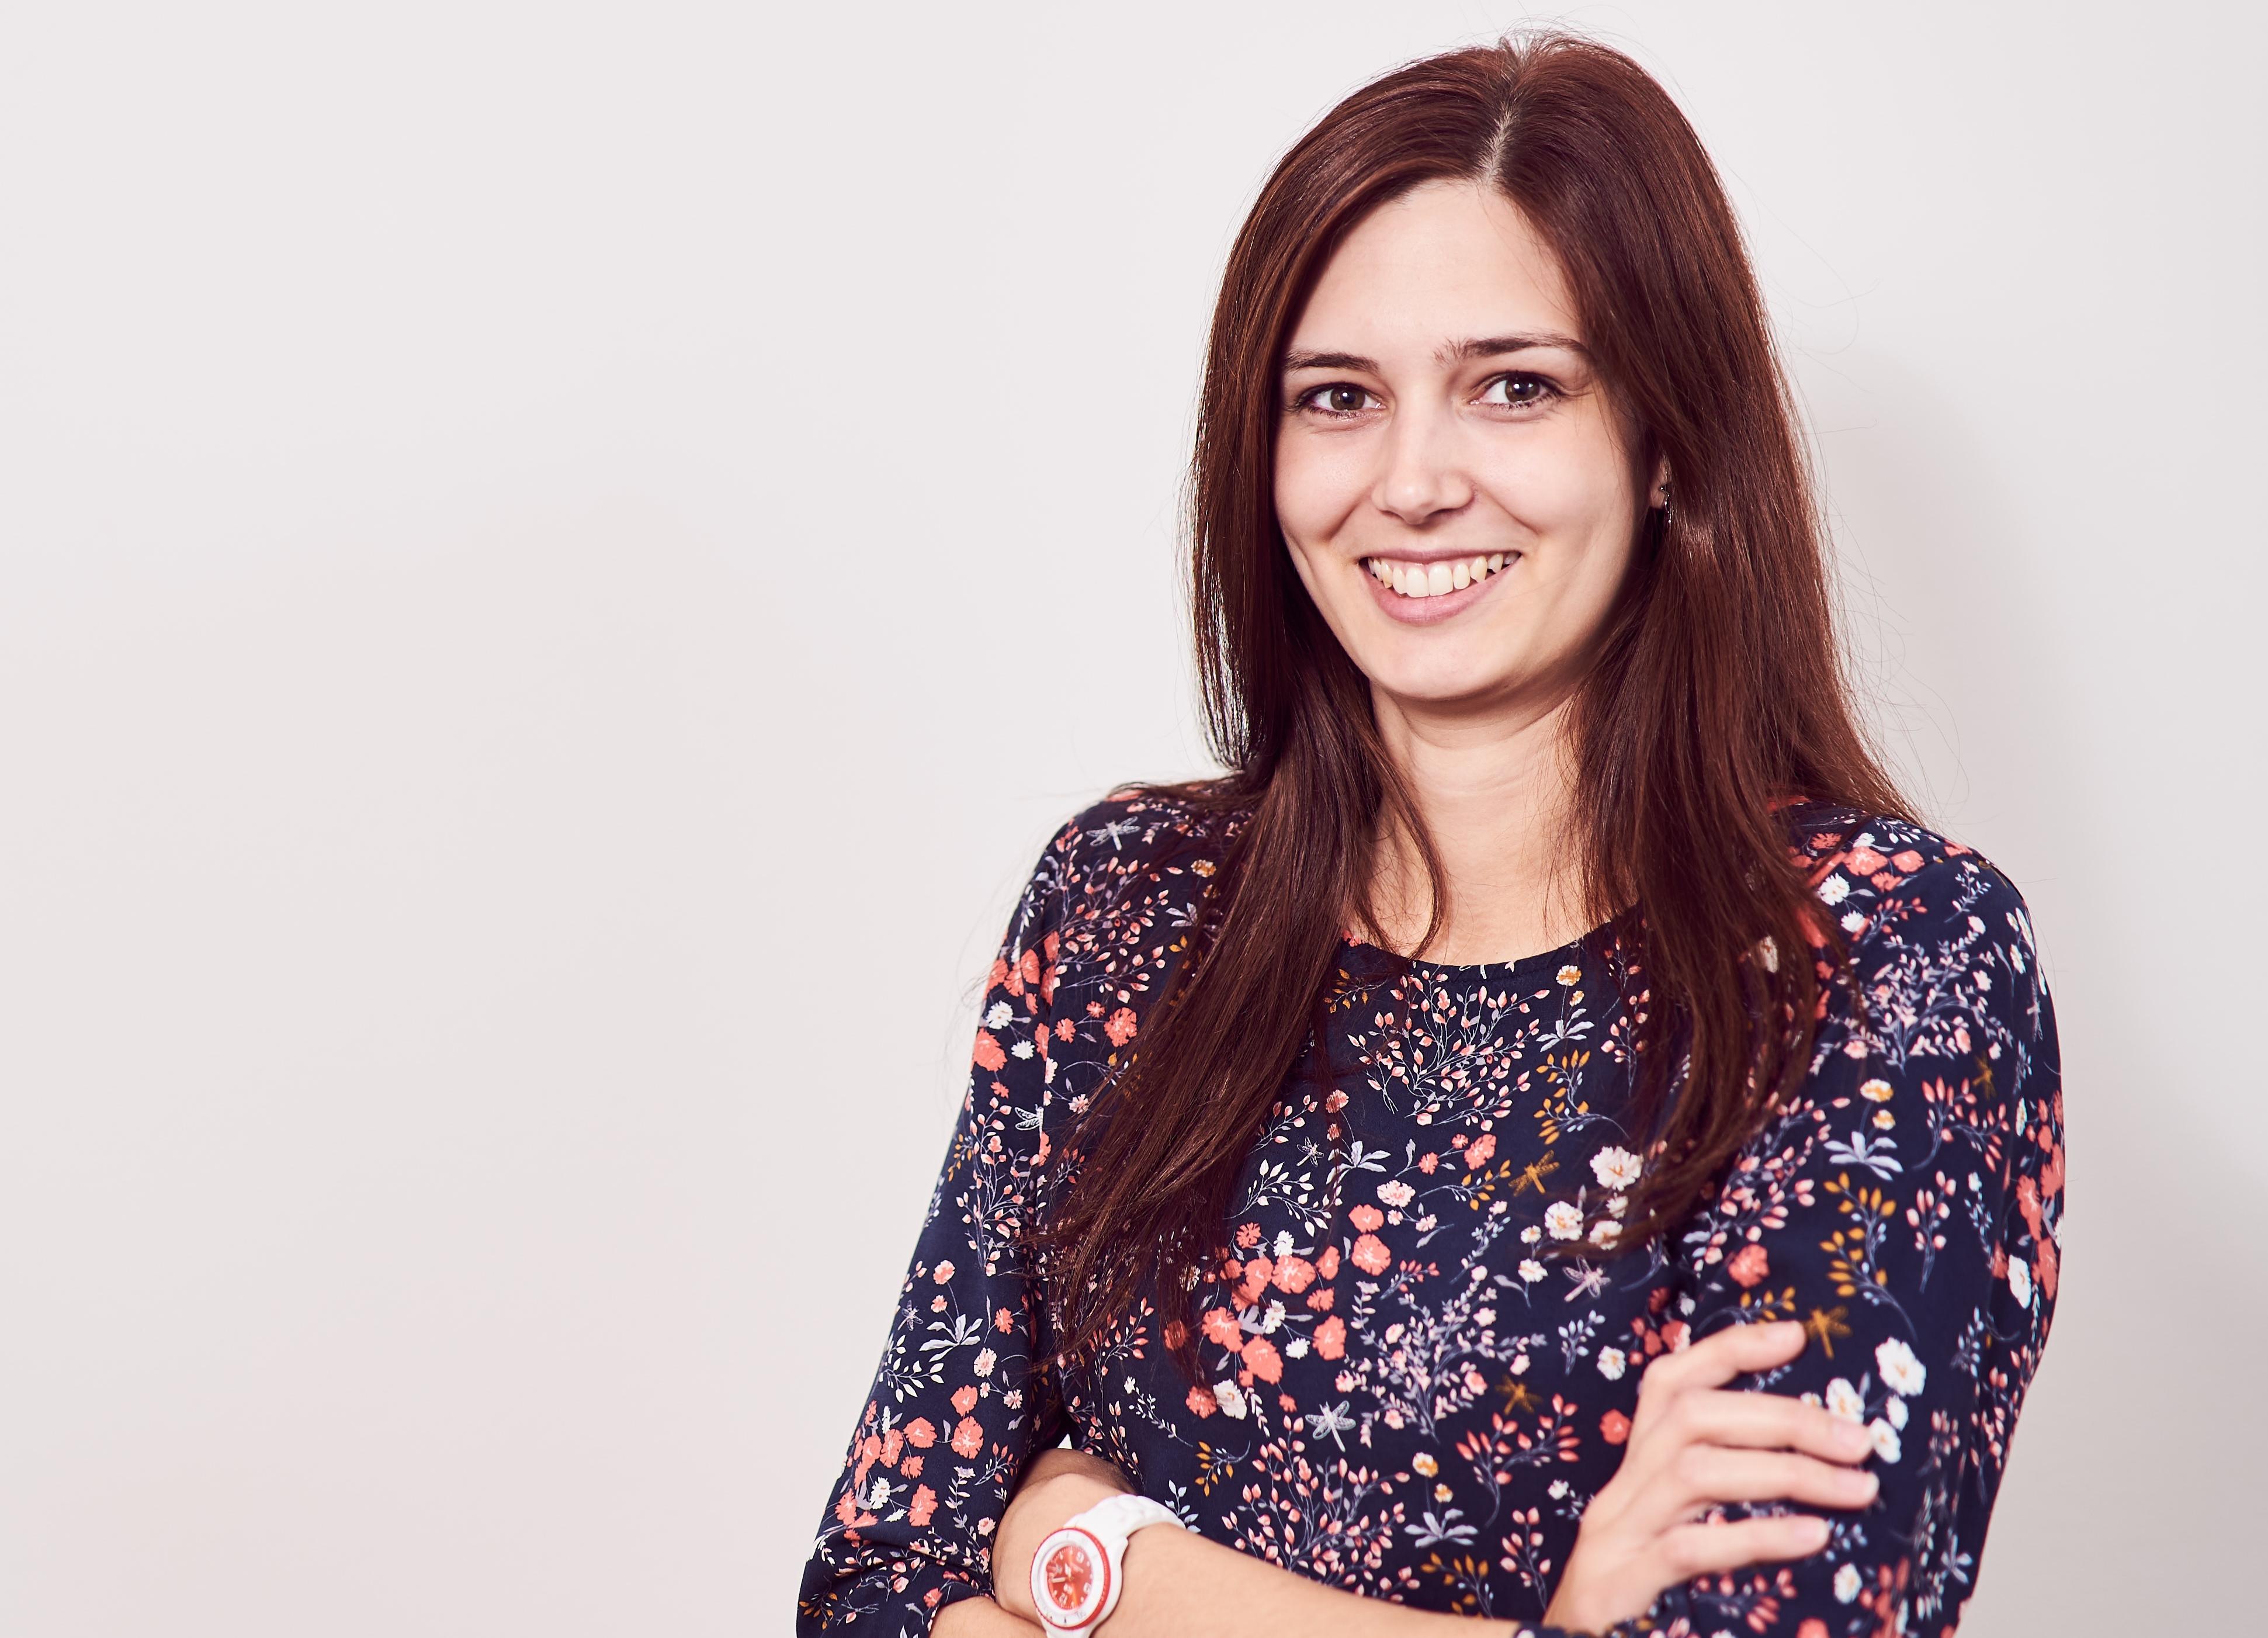 Nadine Hohenecker